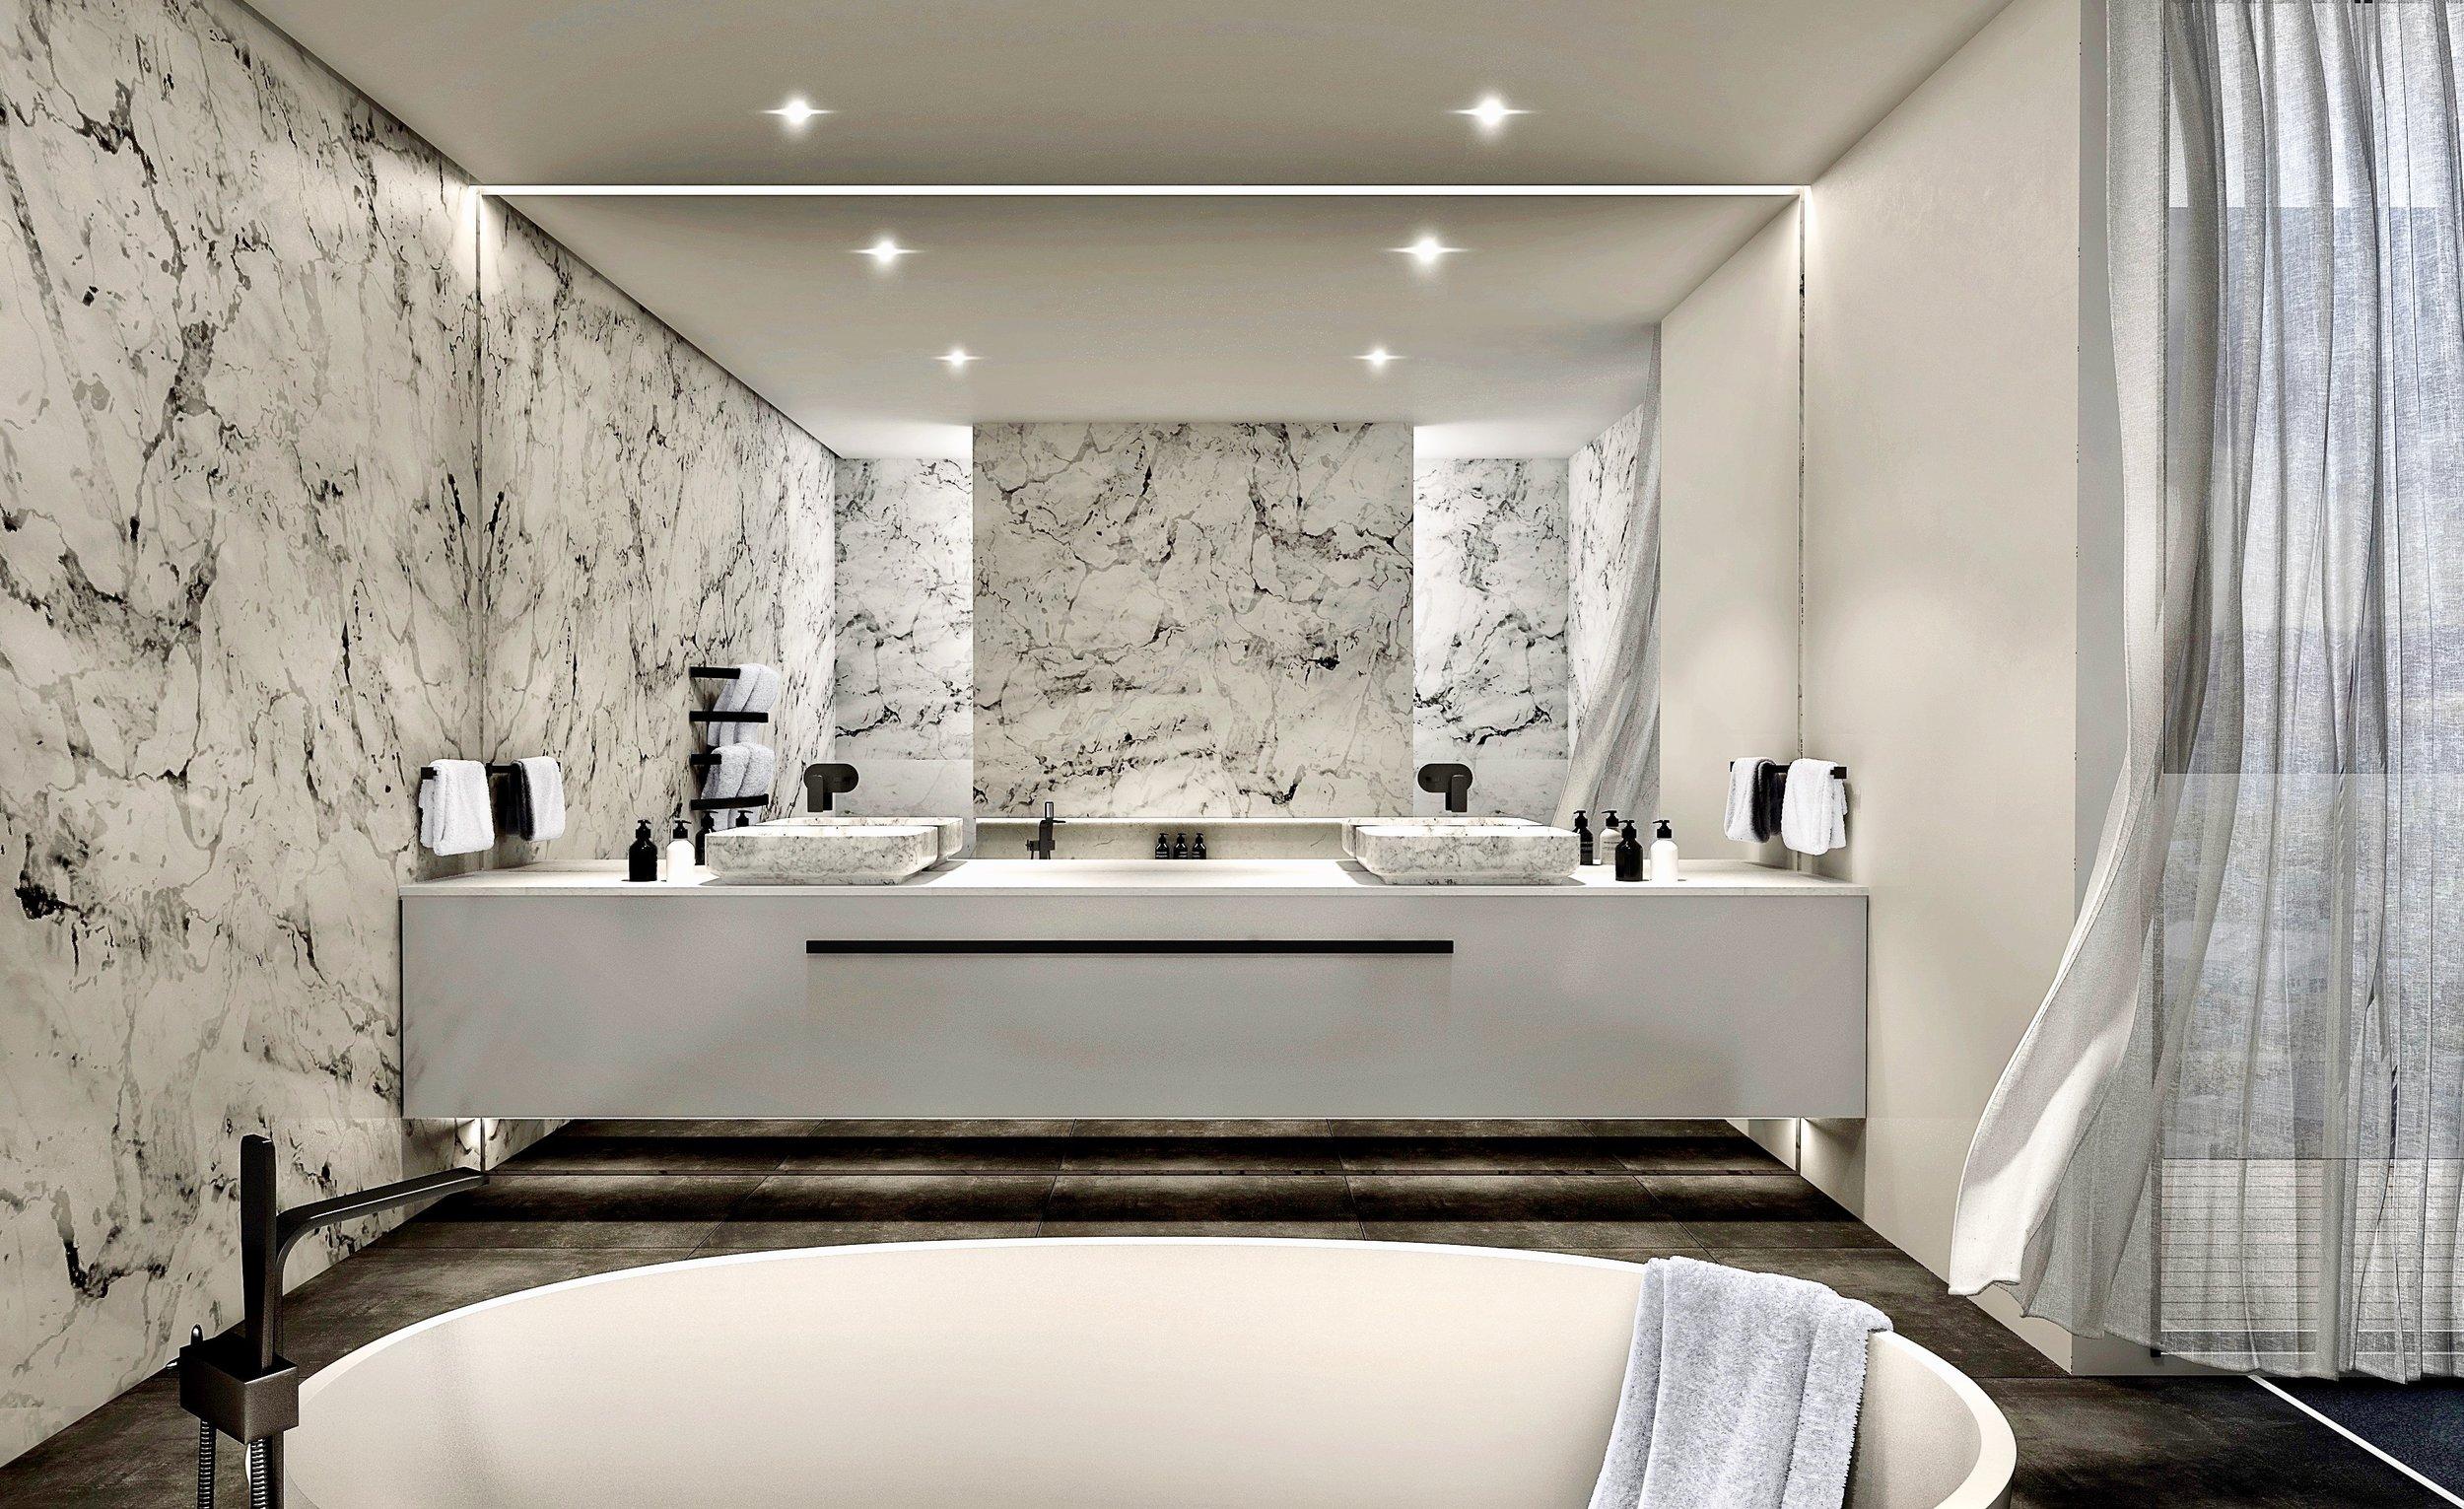 webber-bathroom-v5-a (3) 2.jpg